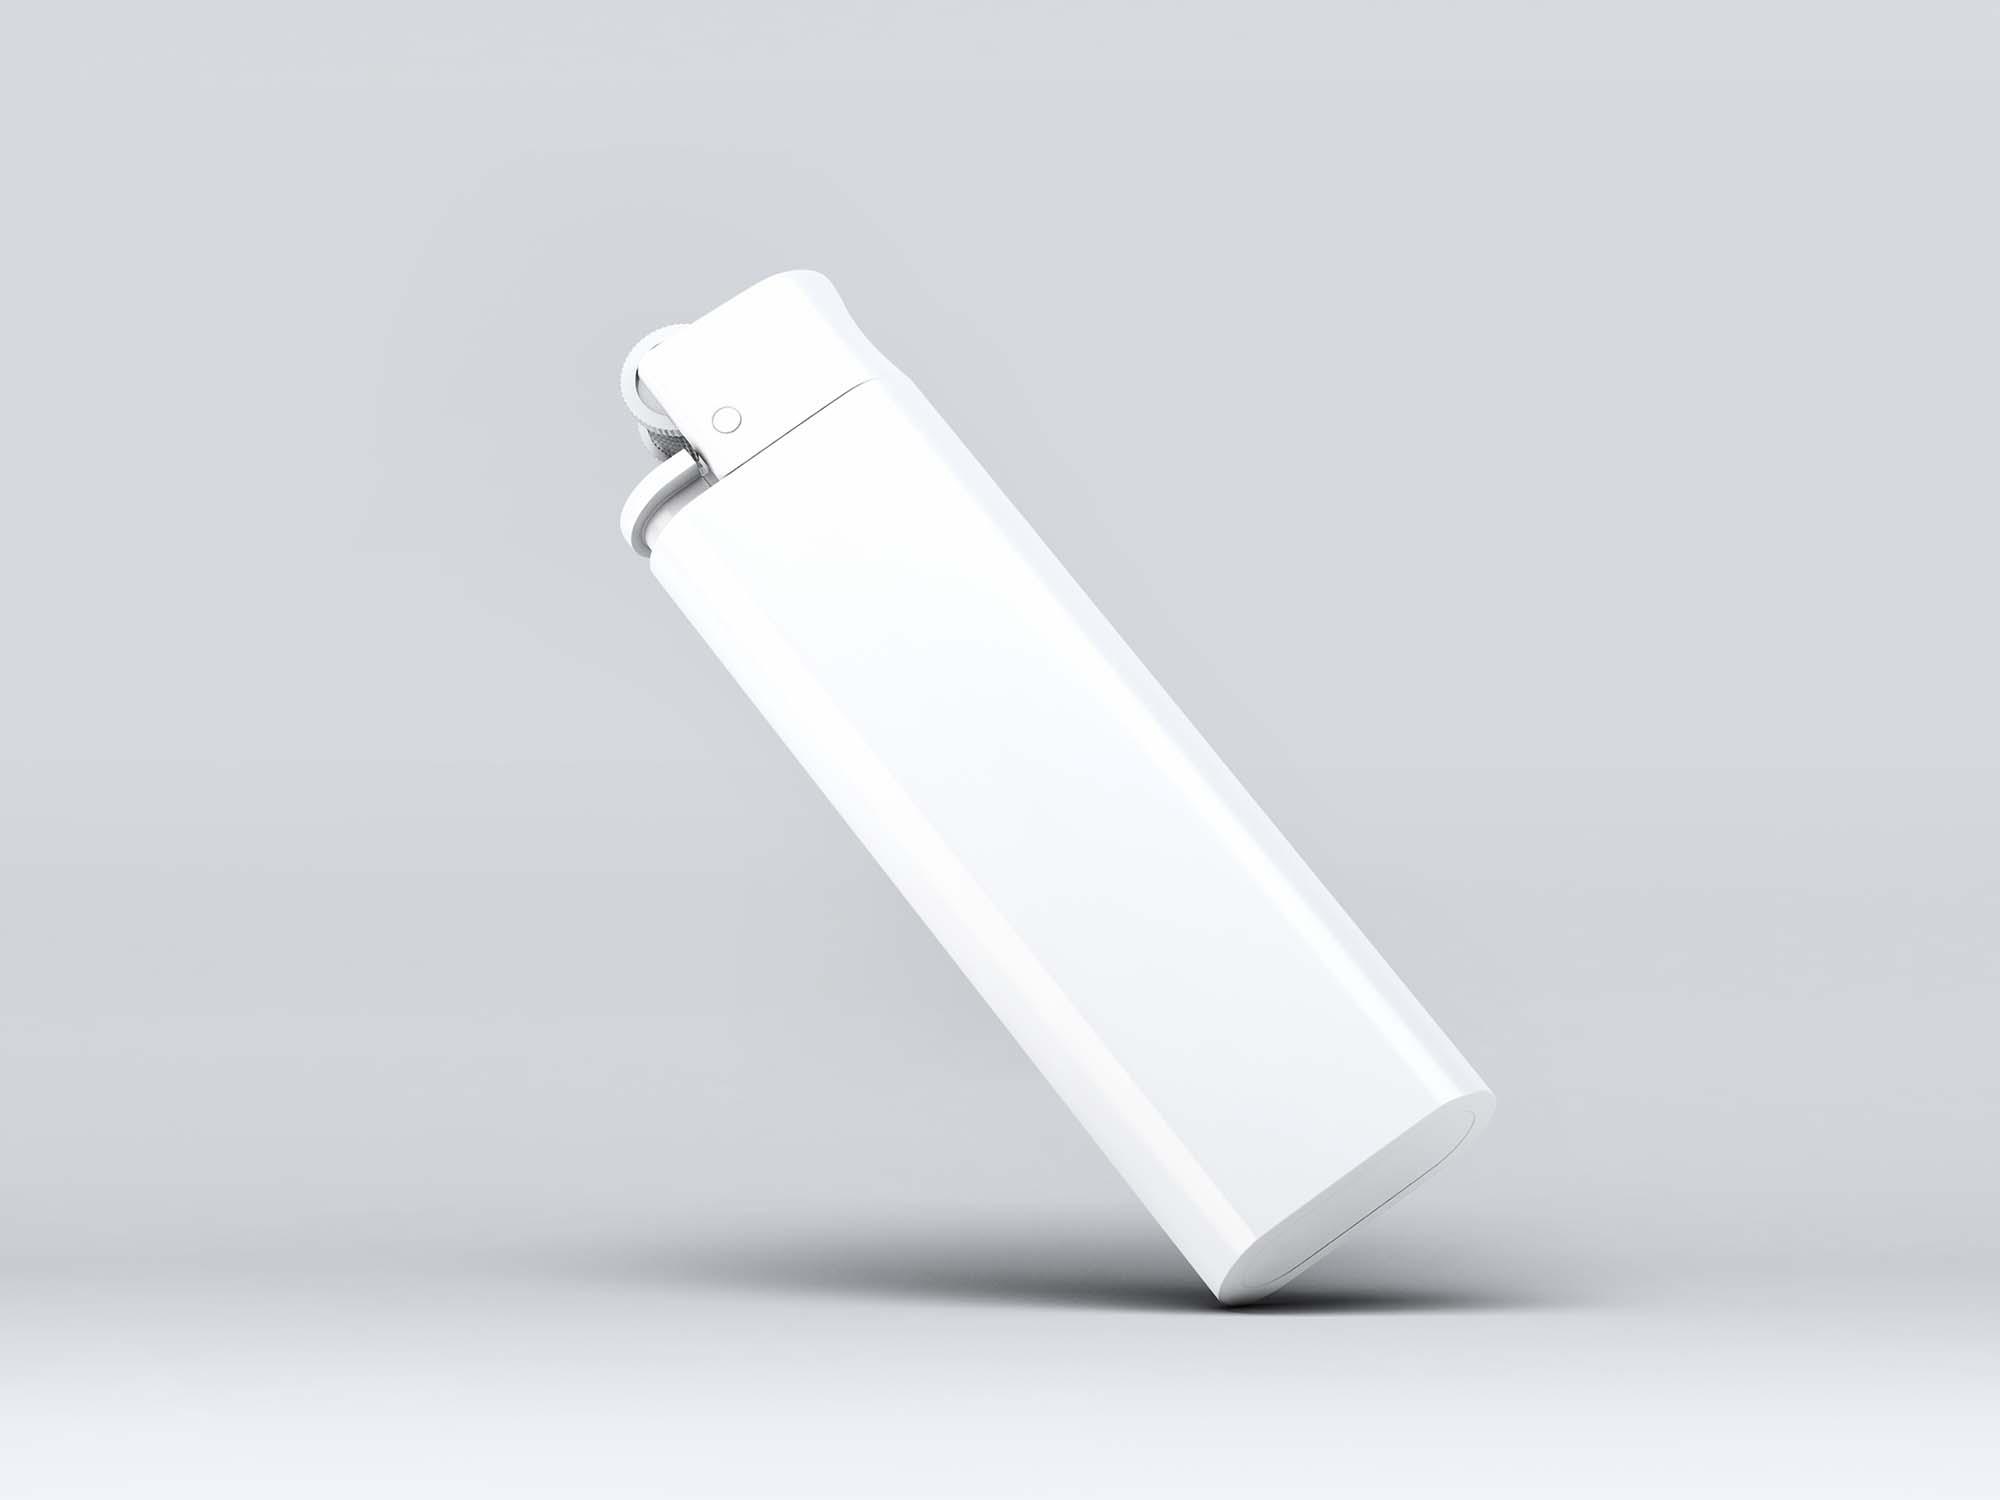 Bic Lighter Mockup 2